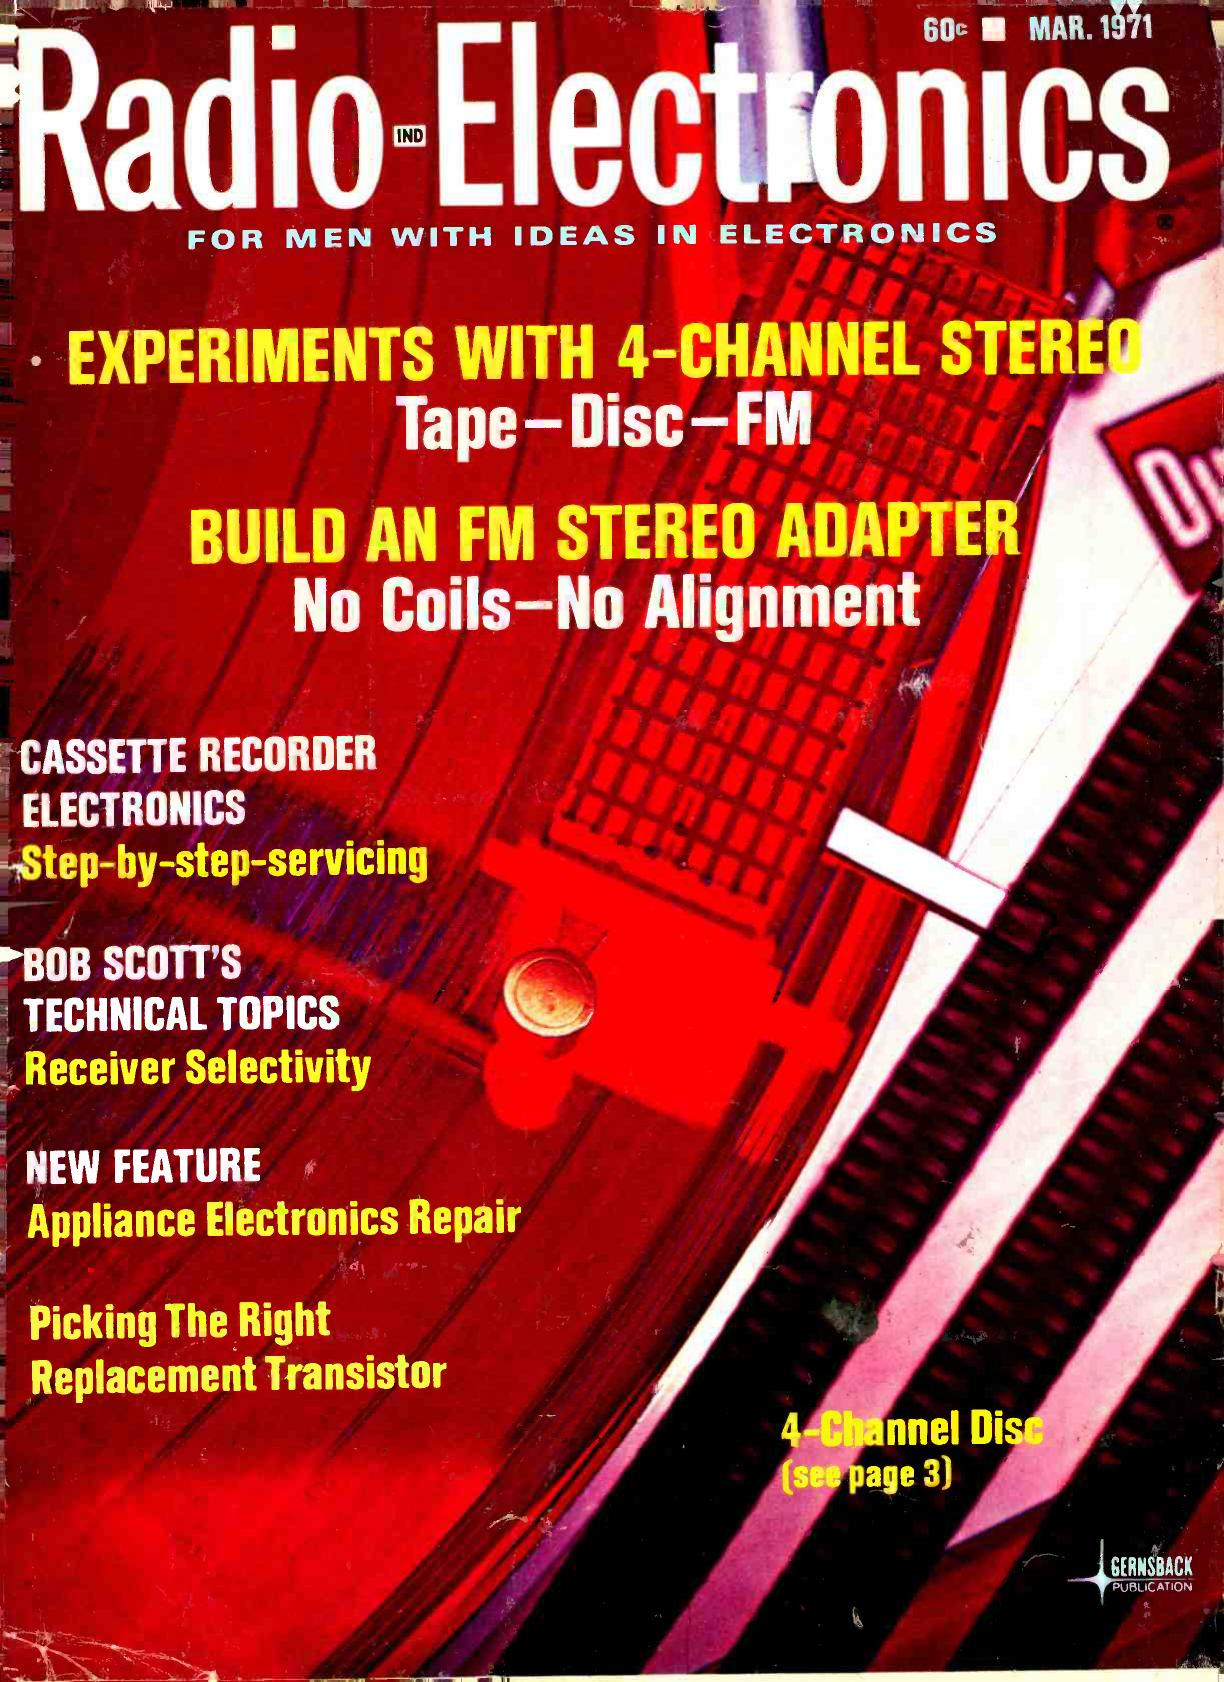 Teac Lp-500 Cd-rekorder Mit Plasttenspieler /cassetten-player Cd-player & -recorder Tv, Video & Audio